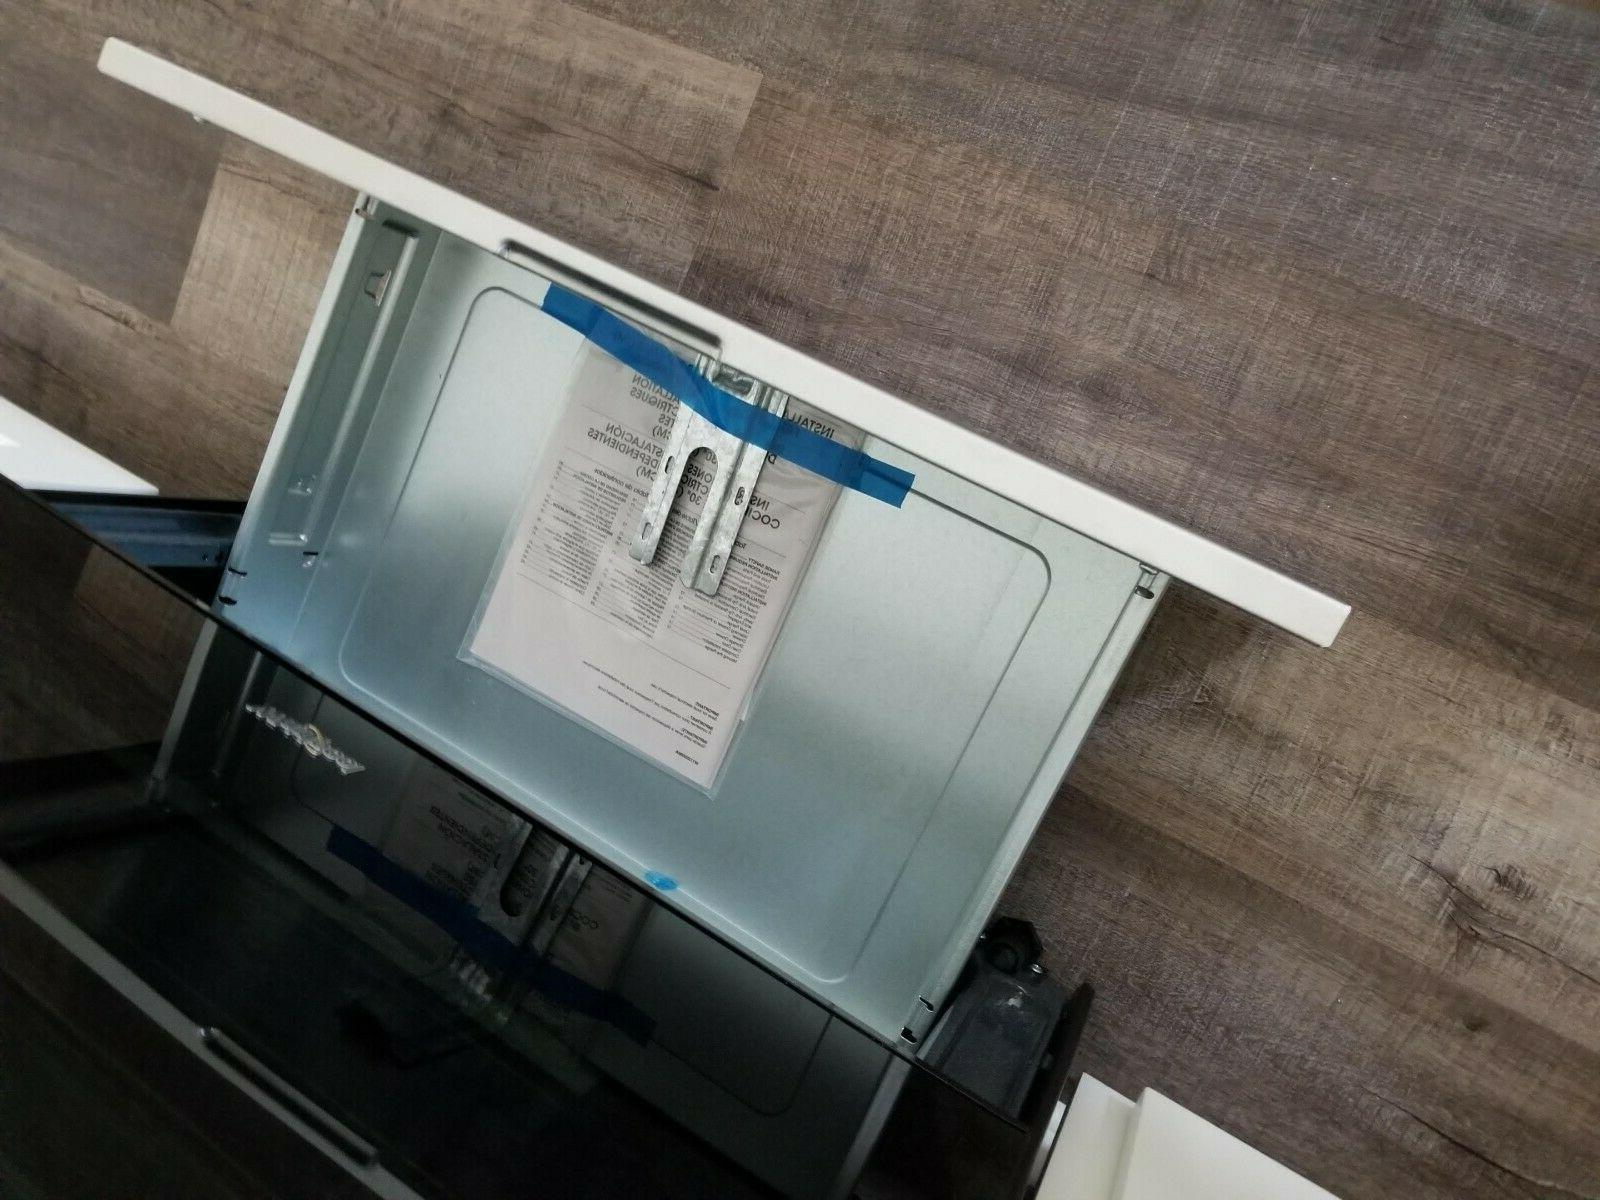 Whirlpool Range Stainless - WFE515S0JS0 Brand